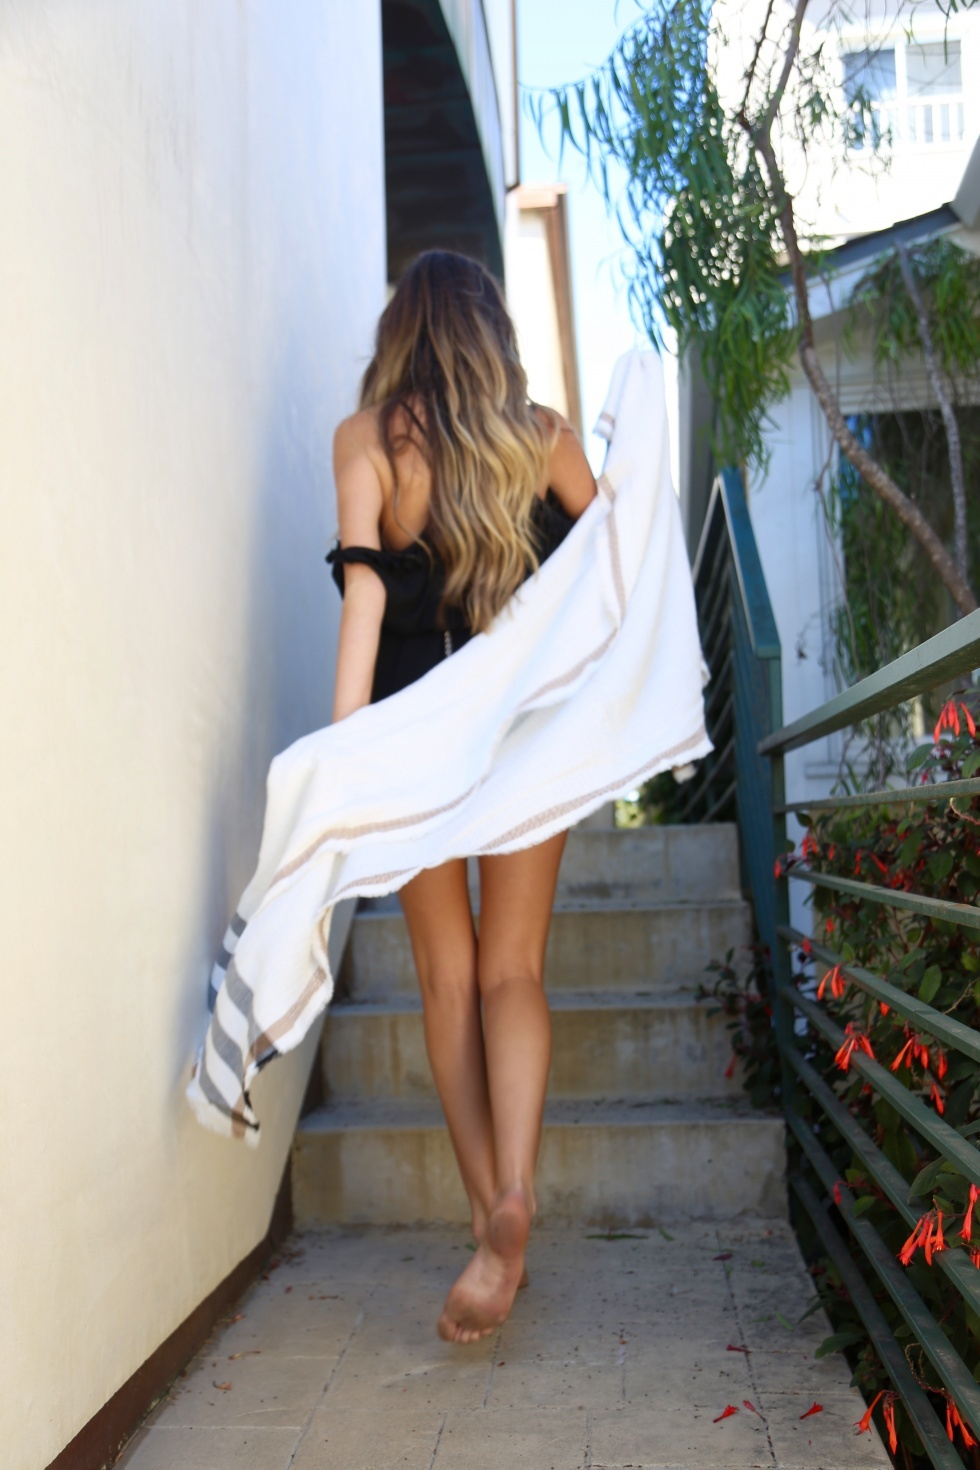 Hanna Montazami S Feet